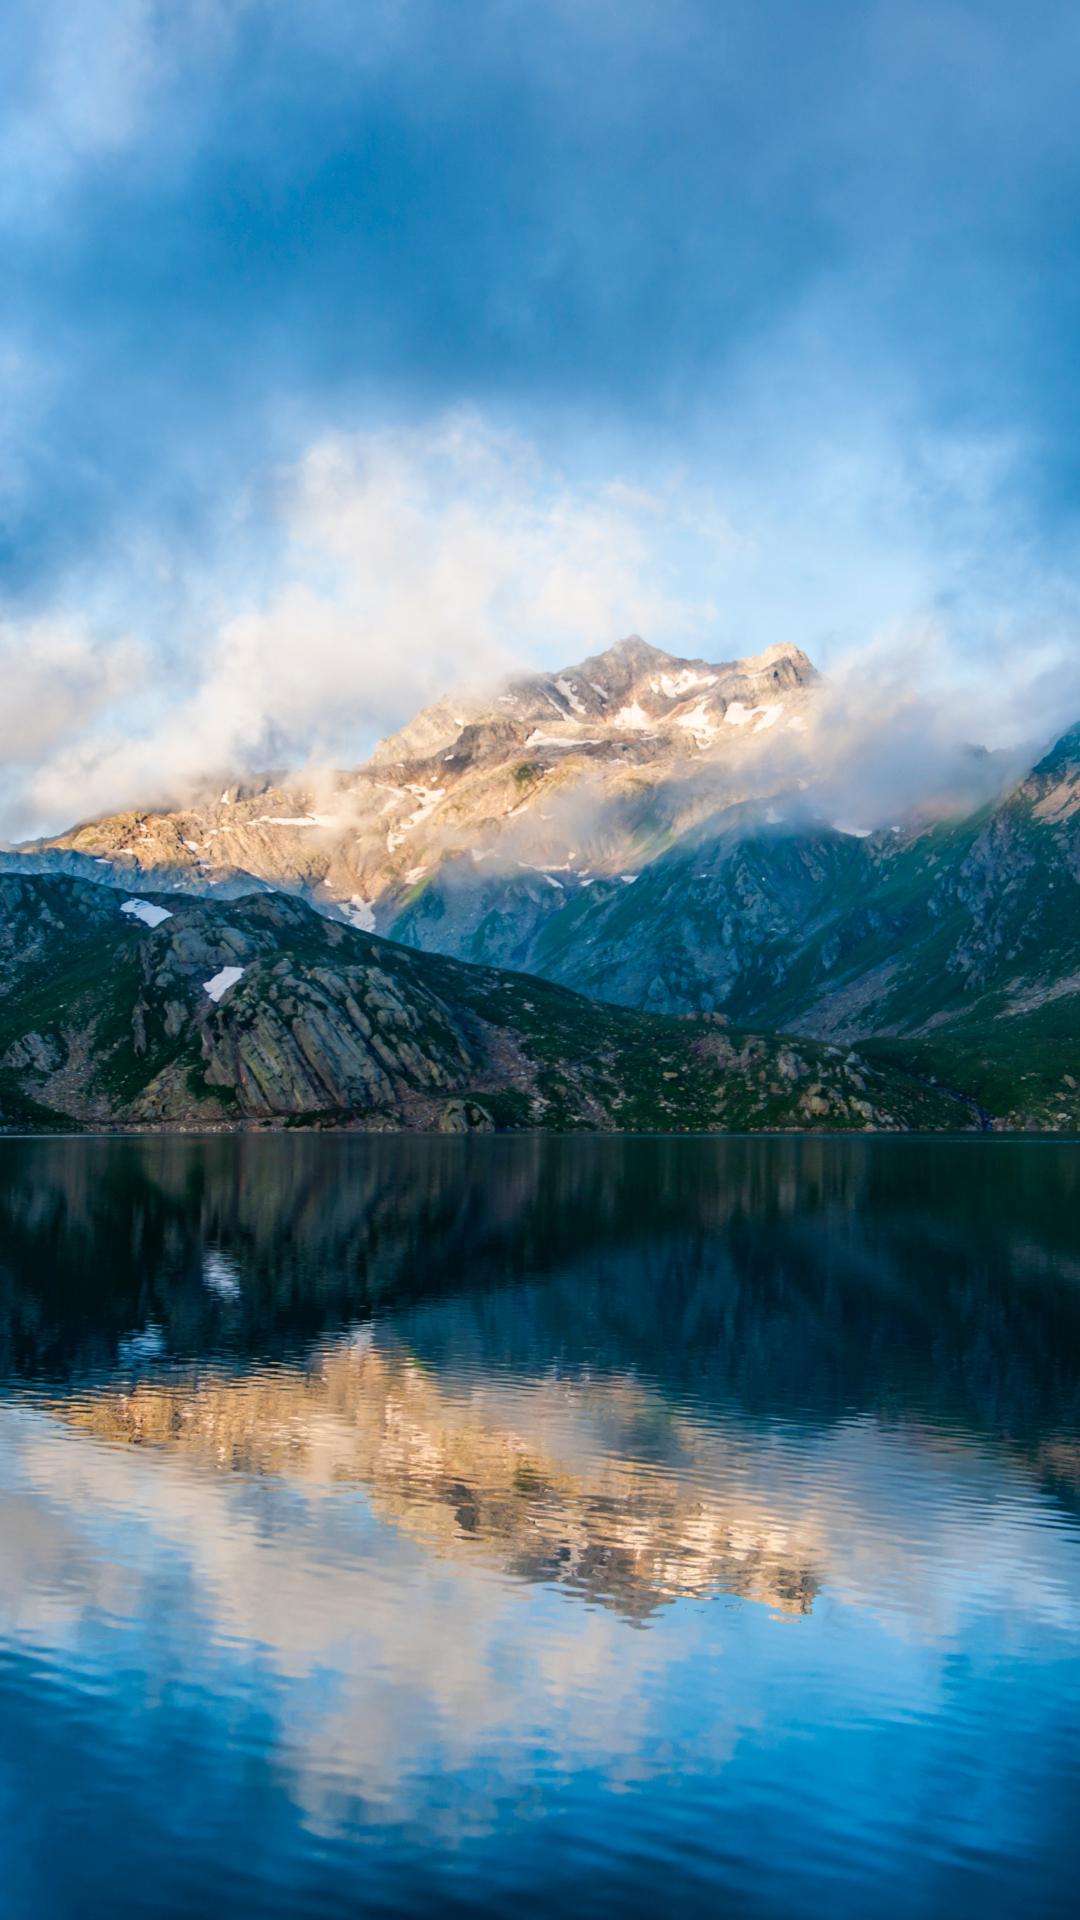 Cool Wallpaper Mountain Iphone - Misty-Mountains-iPhone-wallpaper-1080x1920  Trends_282930.jpg